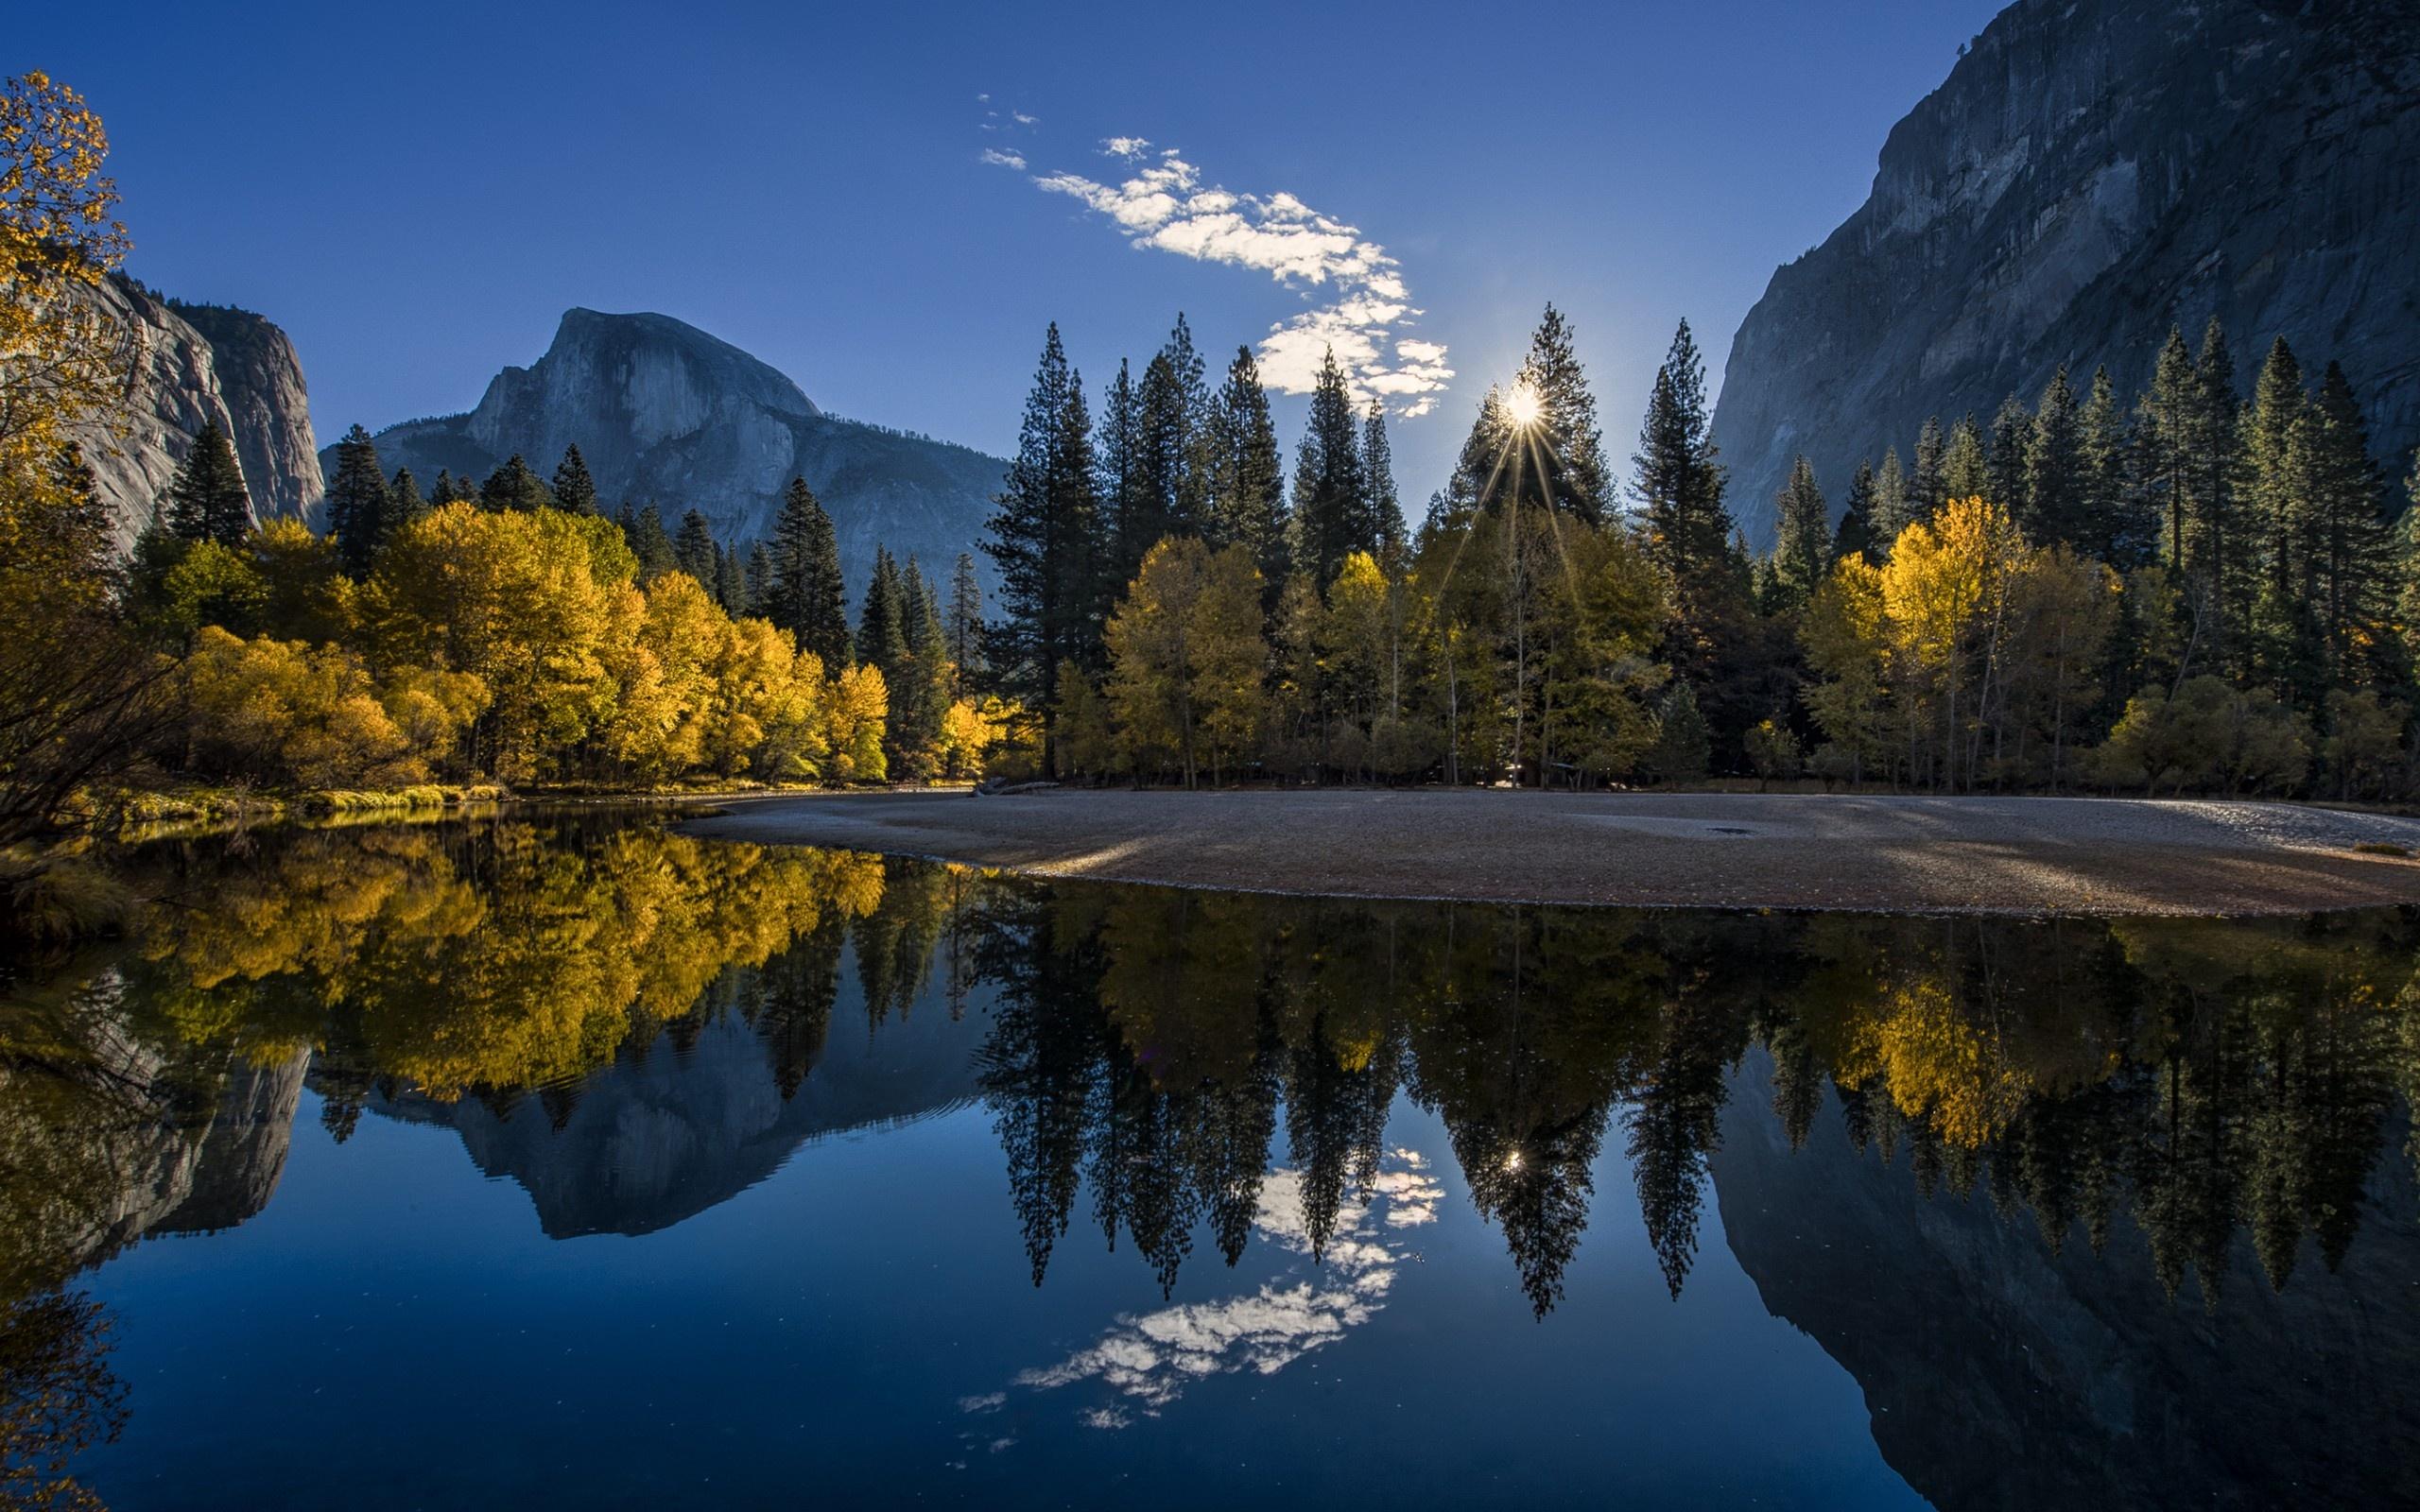 Wallpaper Yosemite National 2560x1600